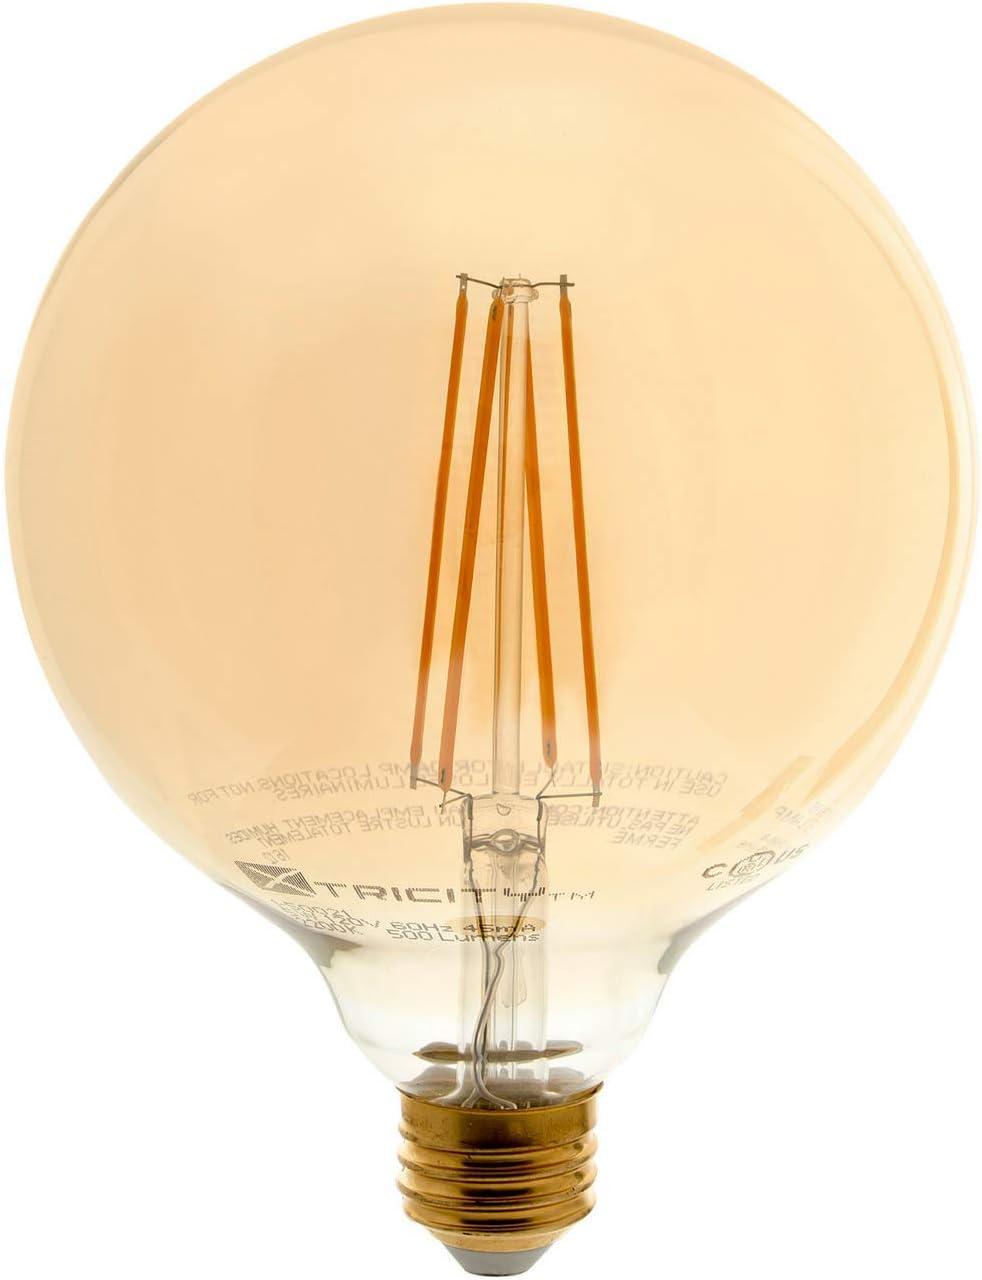 Vintage Globe Led Filament Bulb Edison Style Dimmable 5w 60 Watt Equivalent G40 E26 Medium Base 2200k Soft White 500 Lumens Ul Listed